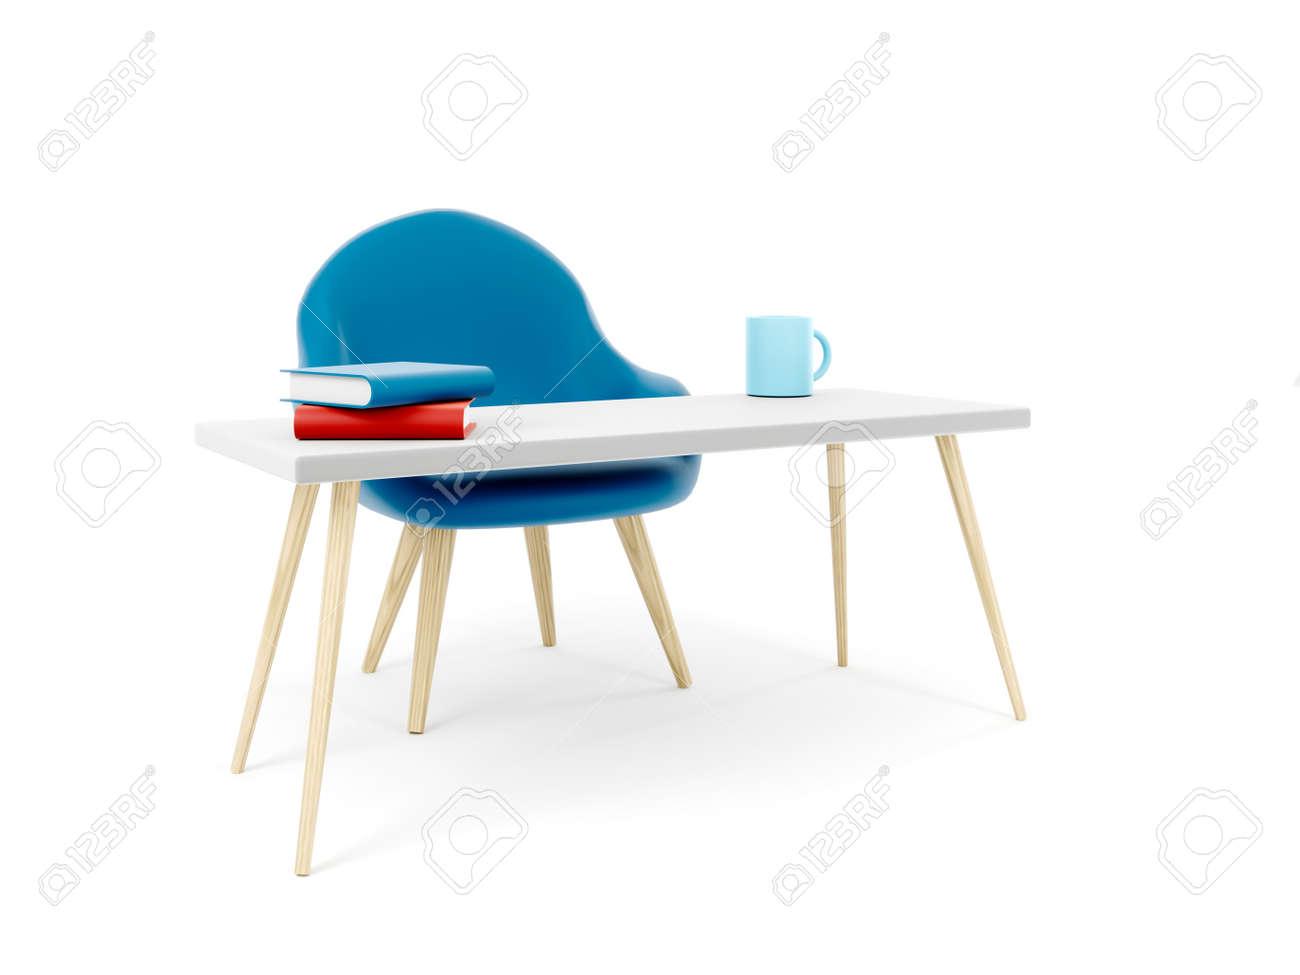 Office table for work, furniture concept 3d illustration - 171588108